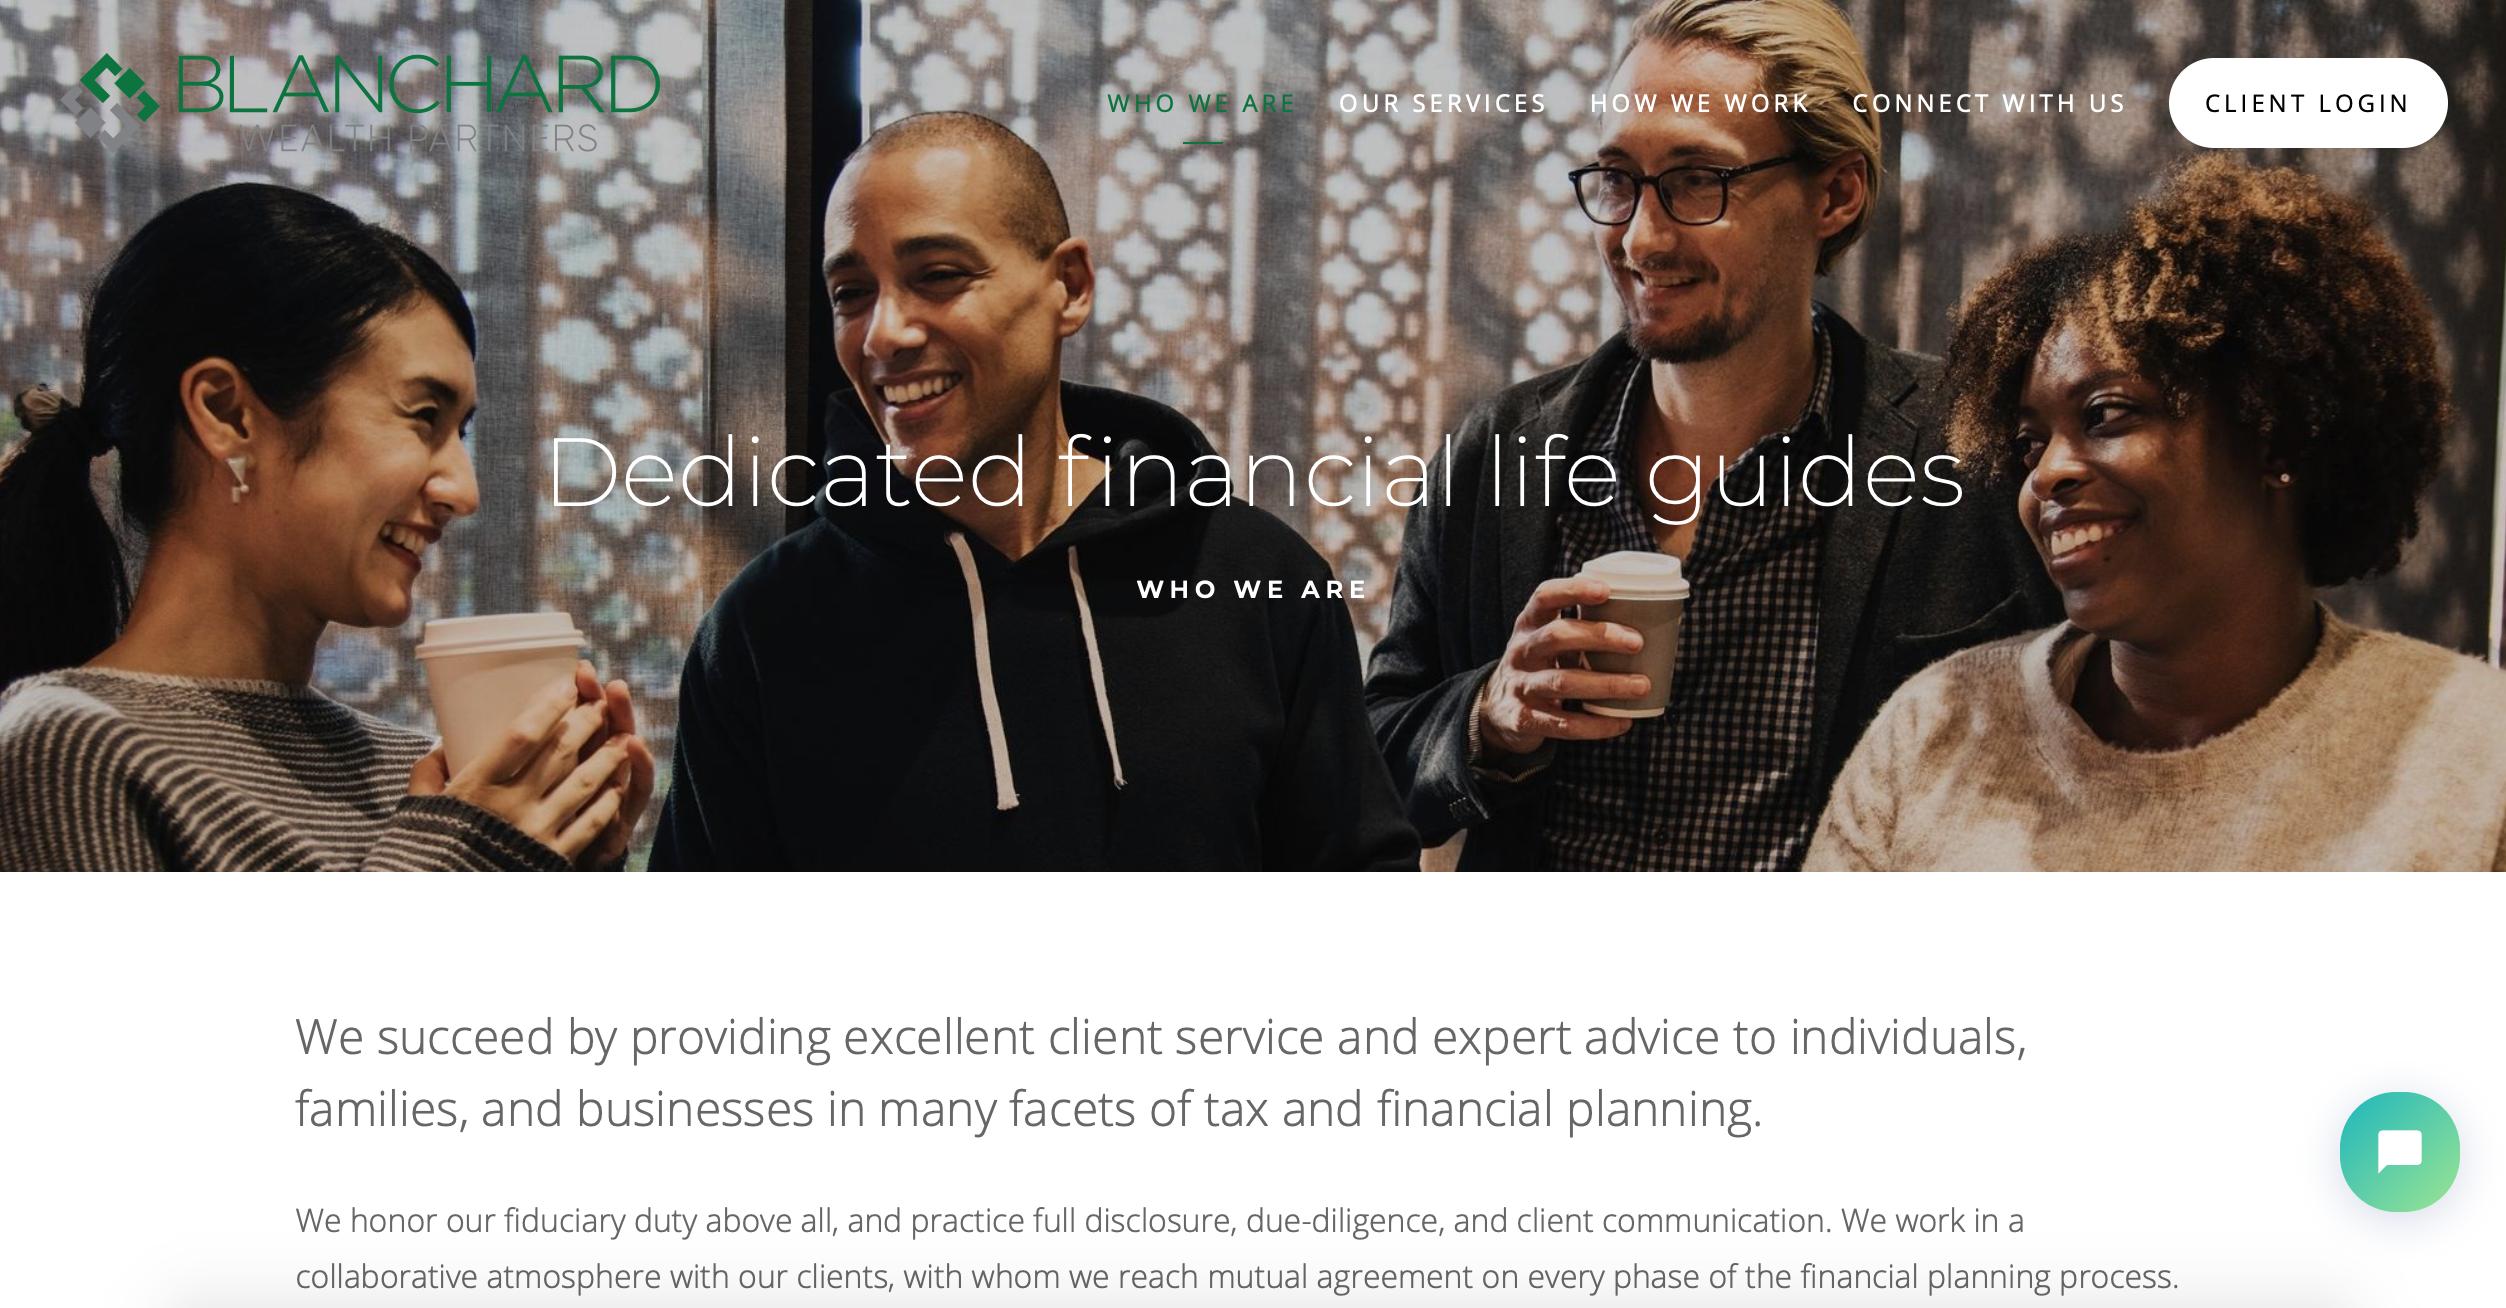 best advisor websites, blanchard wealth partners